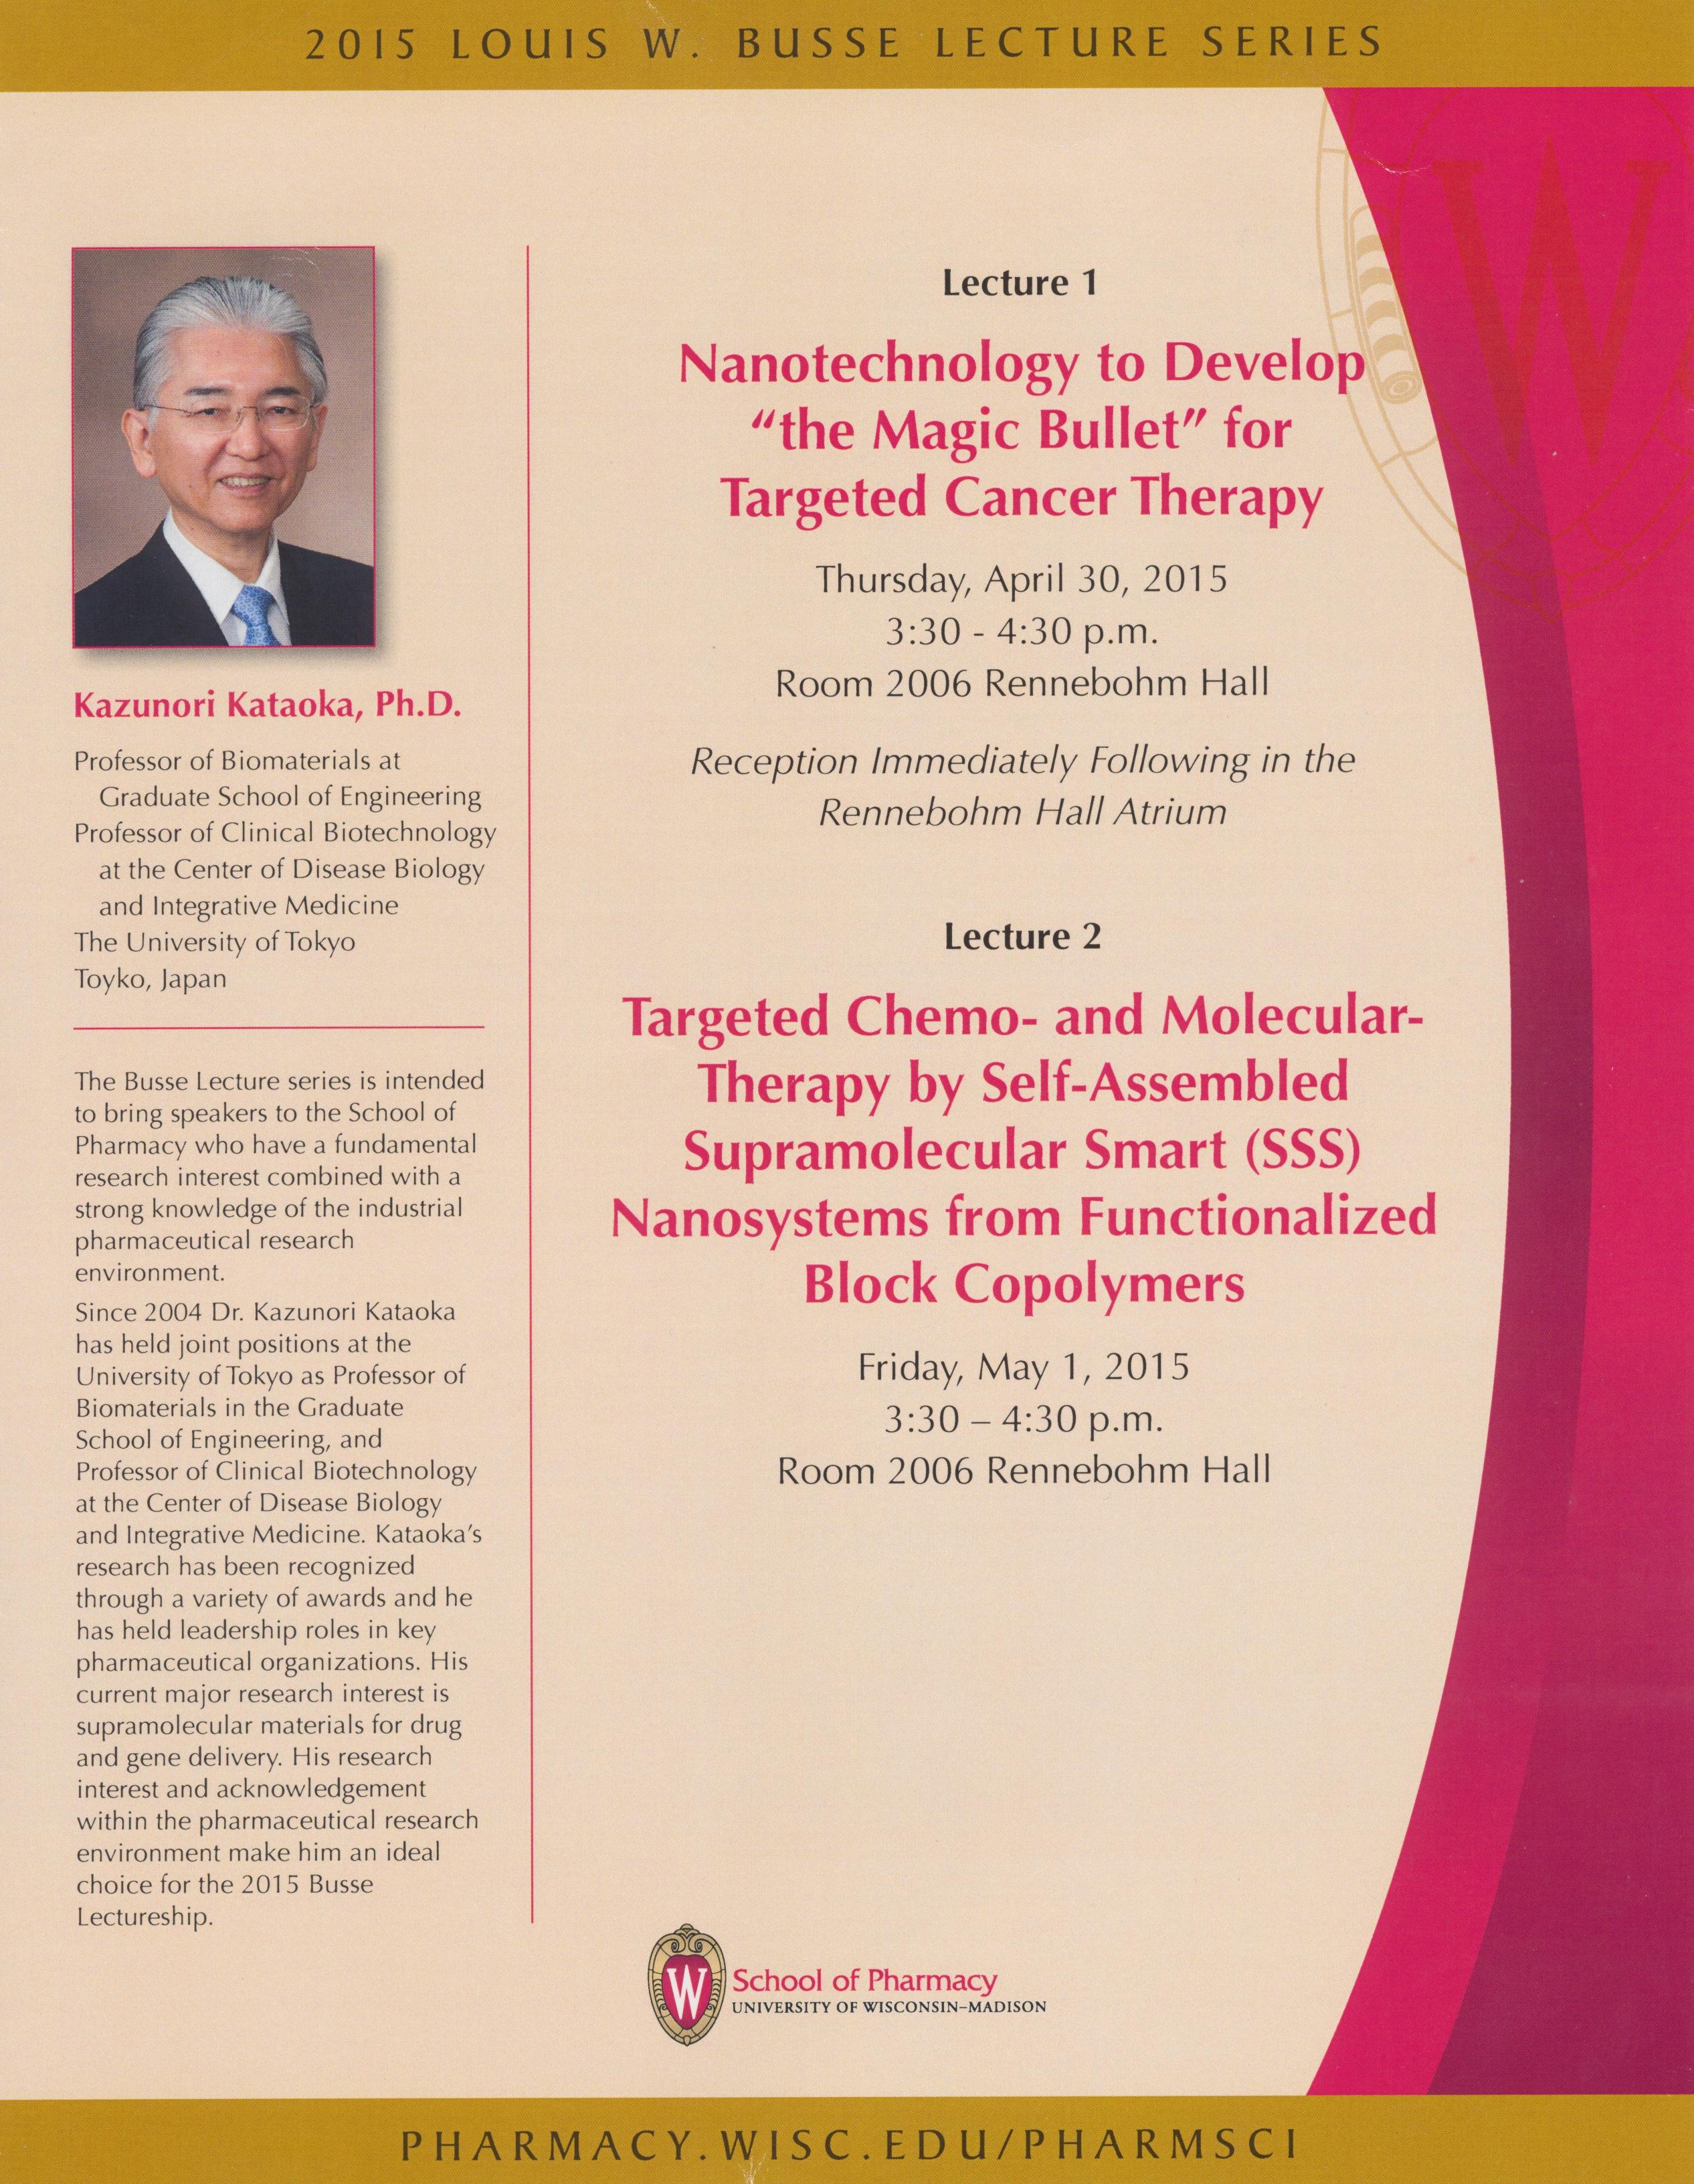 Kwok Pui Lan 0511 Prof Kazunori Kataoka Was Awarded From School Of Pharmacy University Wisconsin Madison To Have 2015 Louis W Busse Lectures On